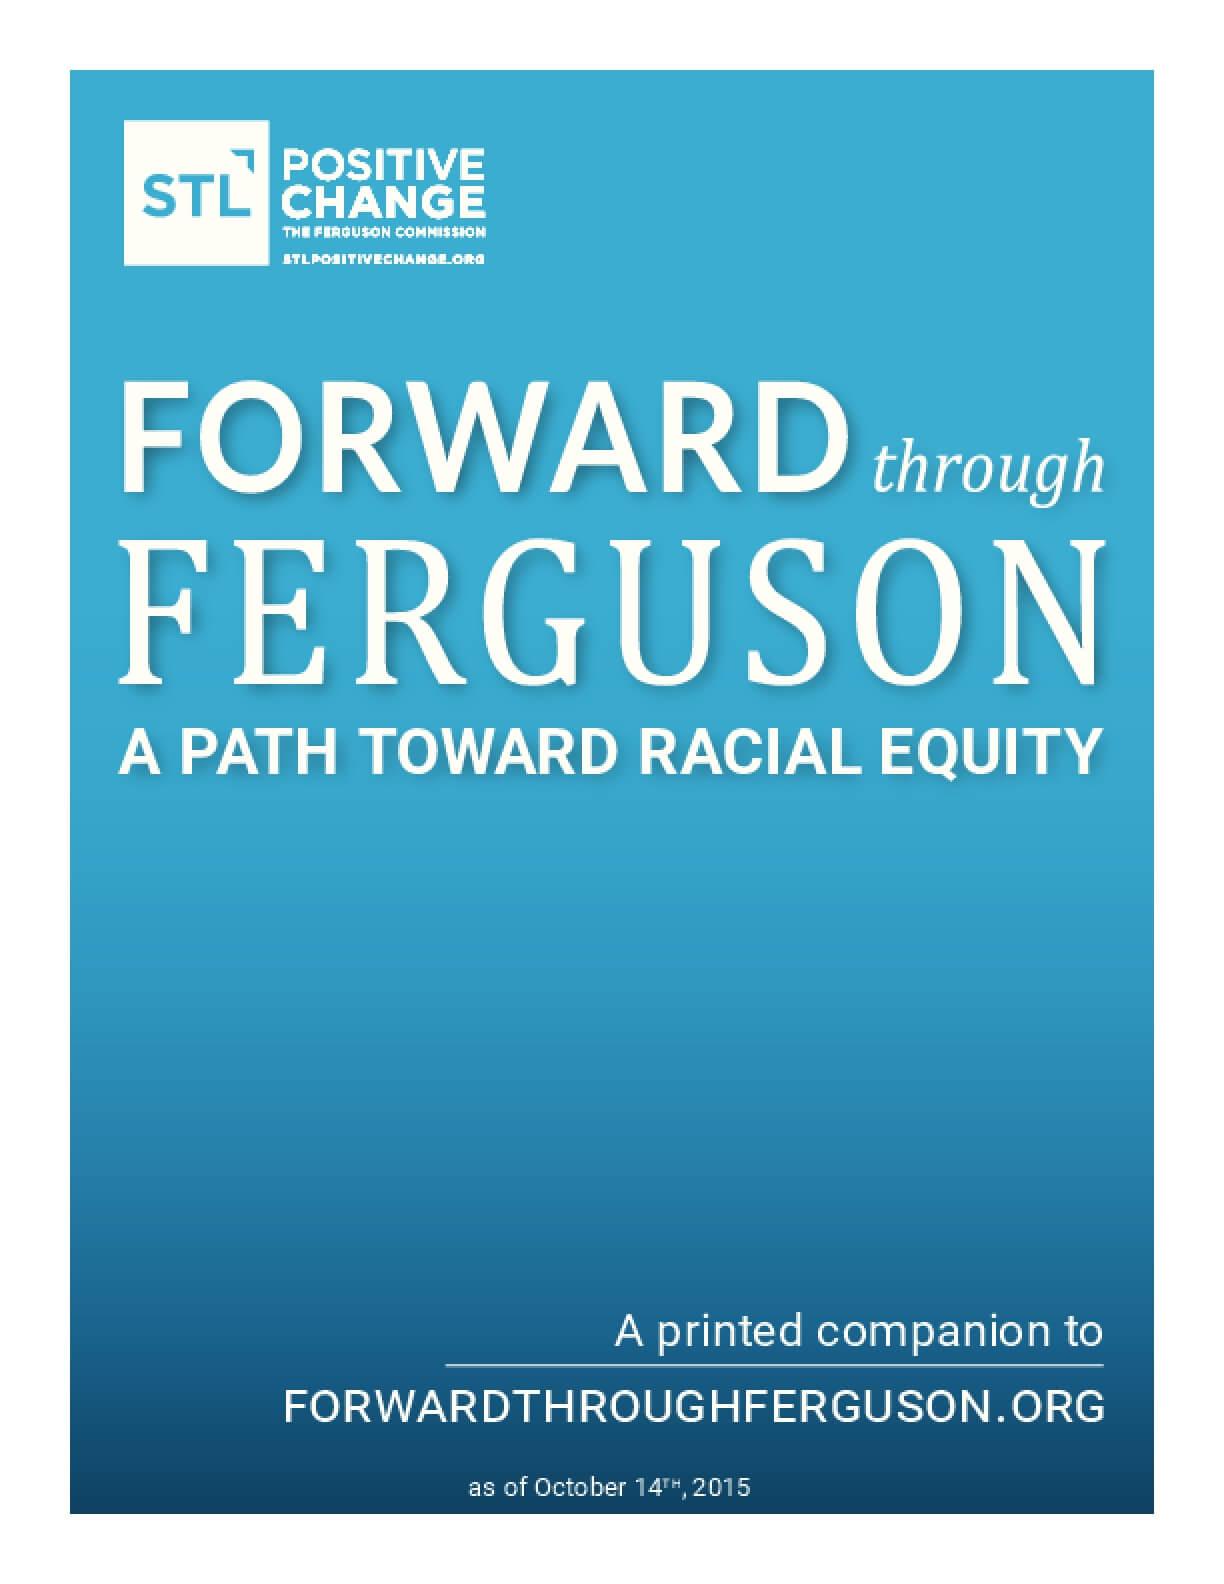 Forward through Ferguson: A Path Toward Racial Equity